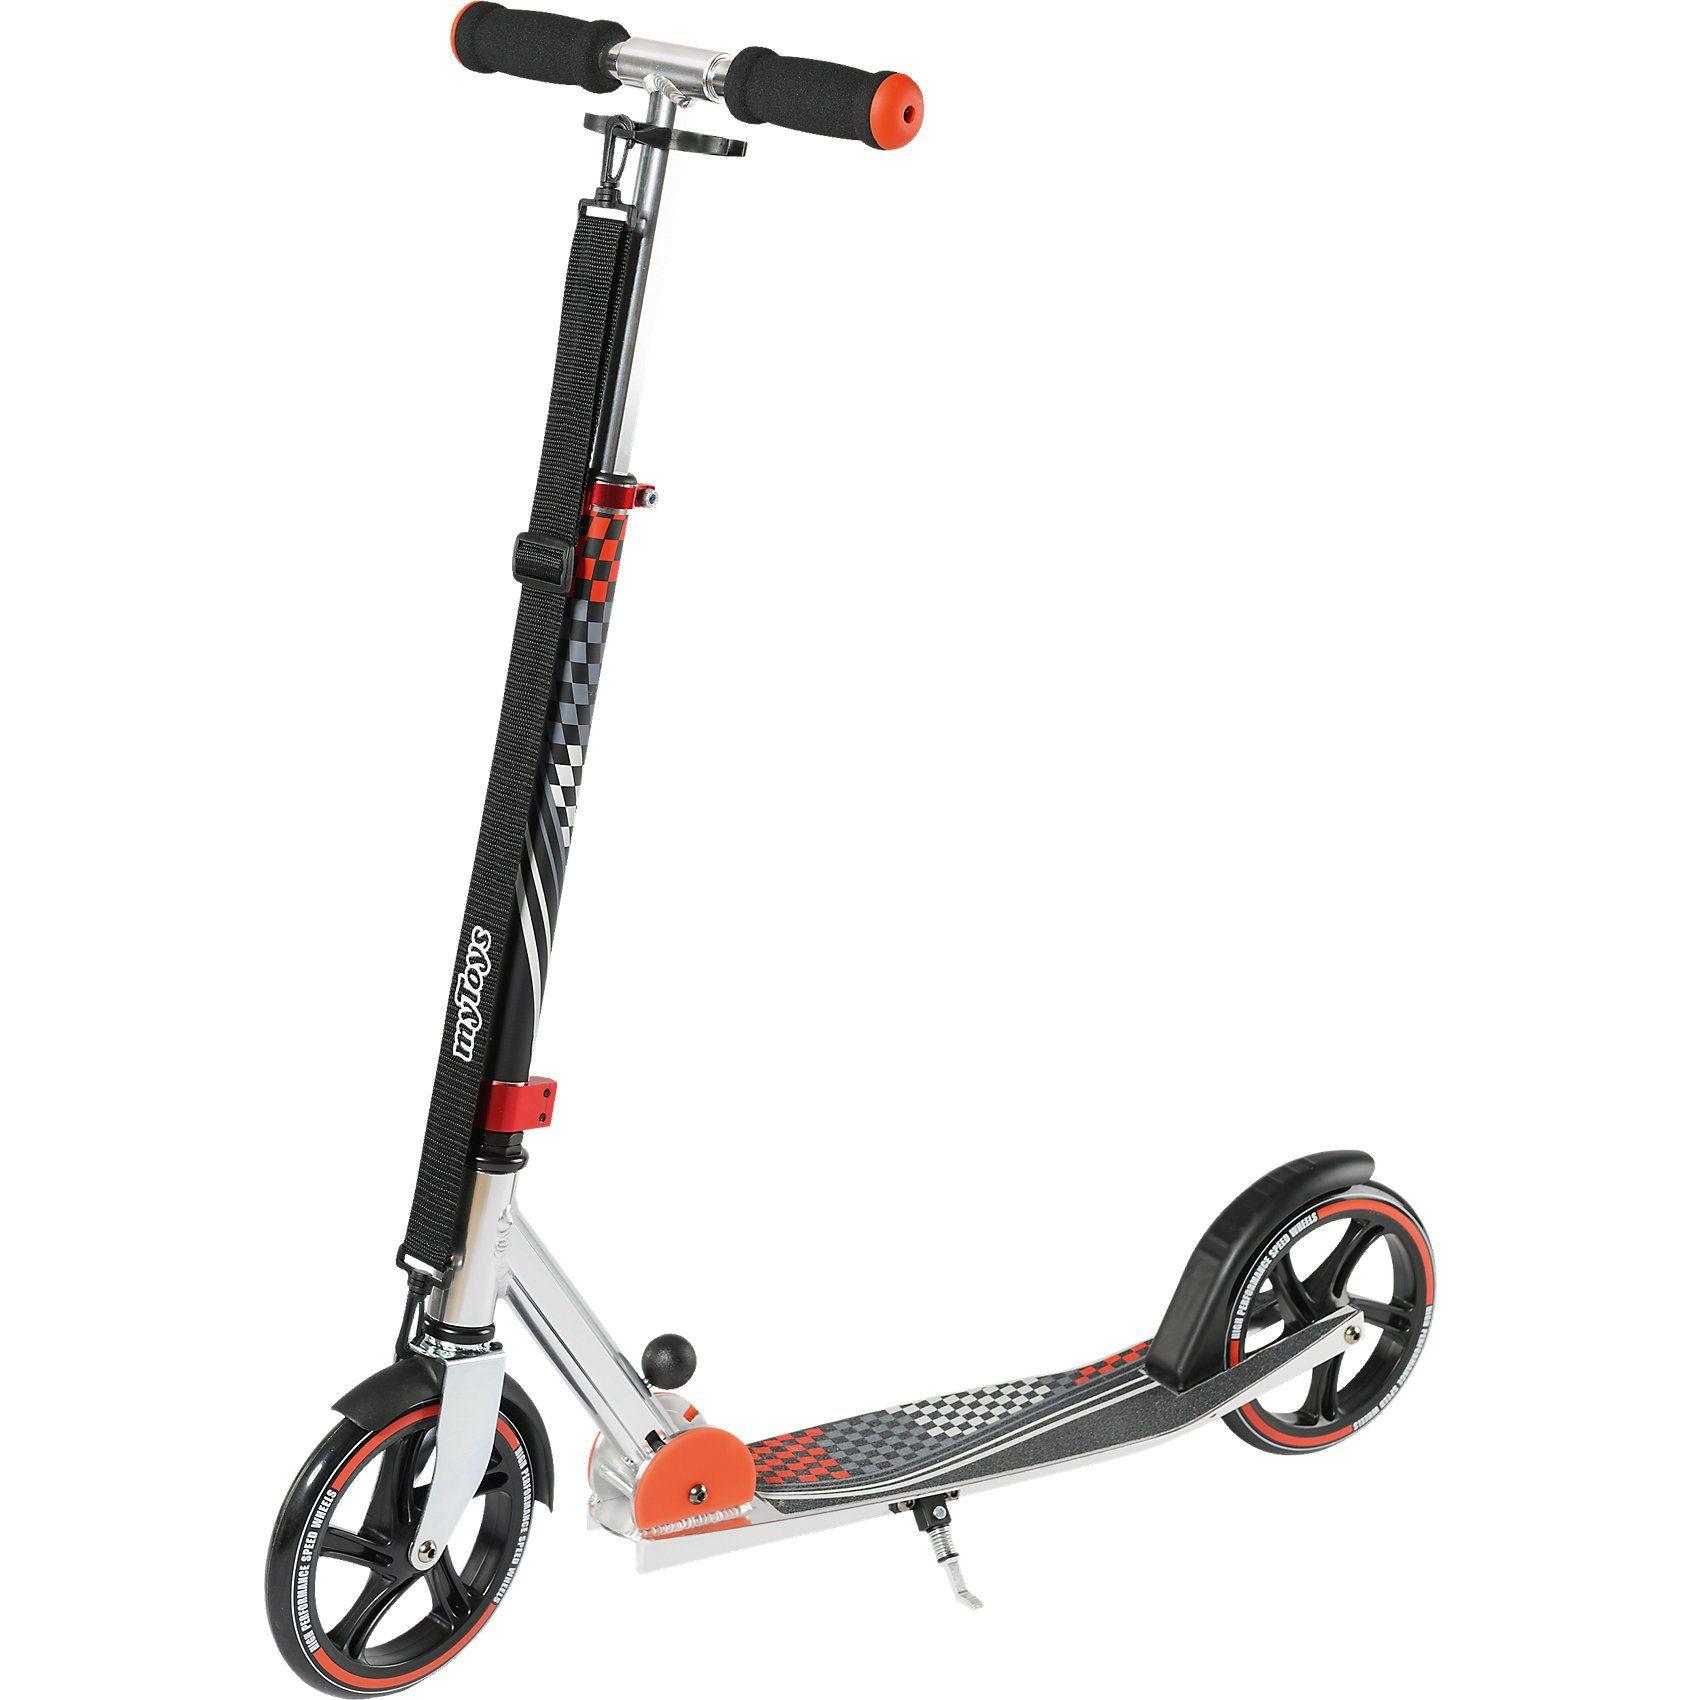 myToys Scooter 205 mit Tragegurt, Design Racing